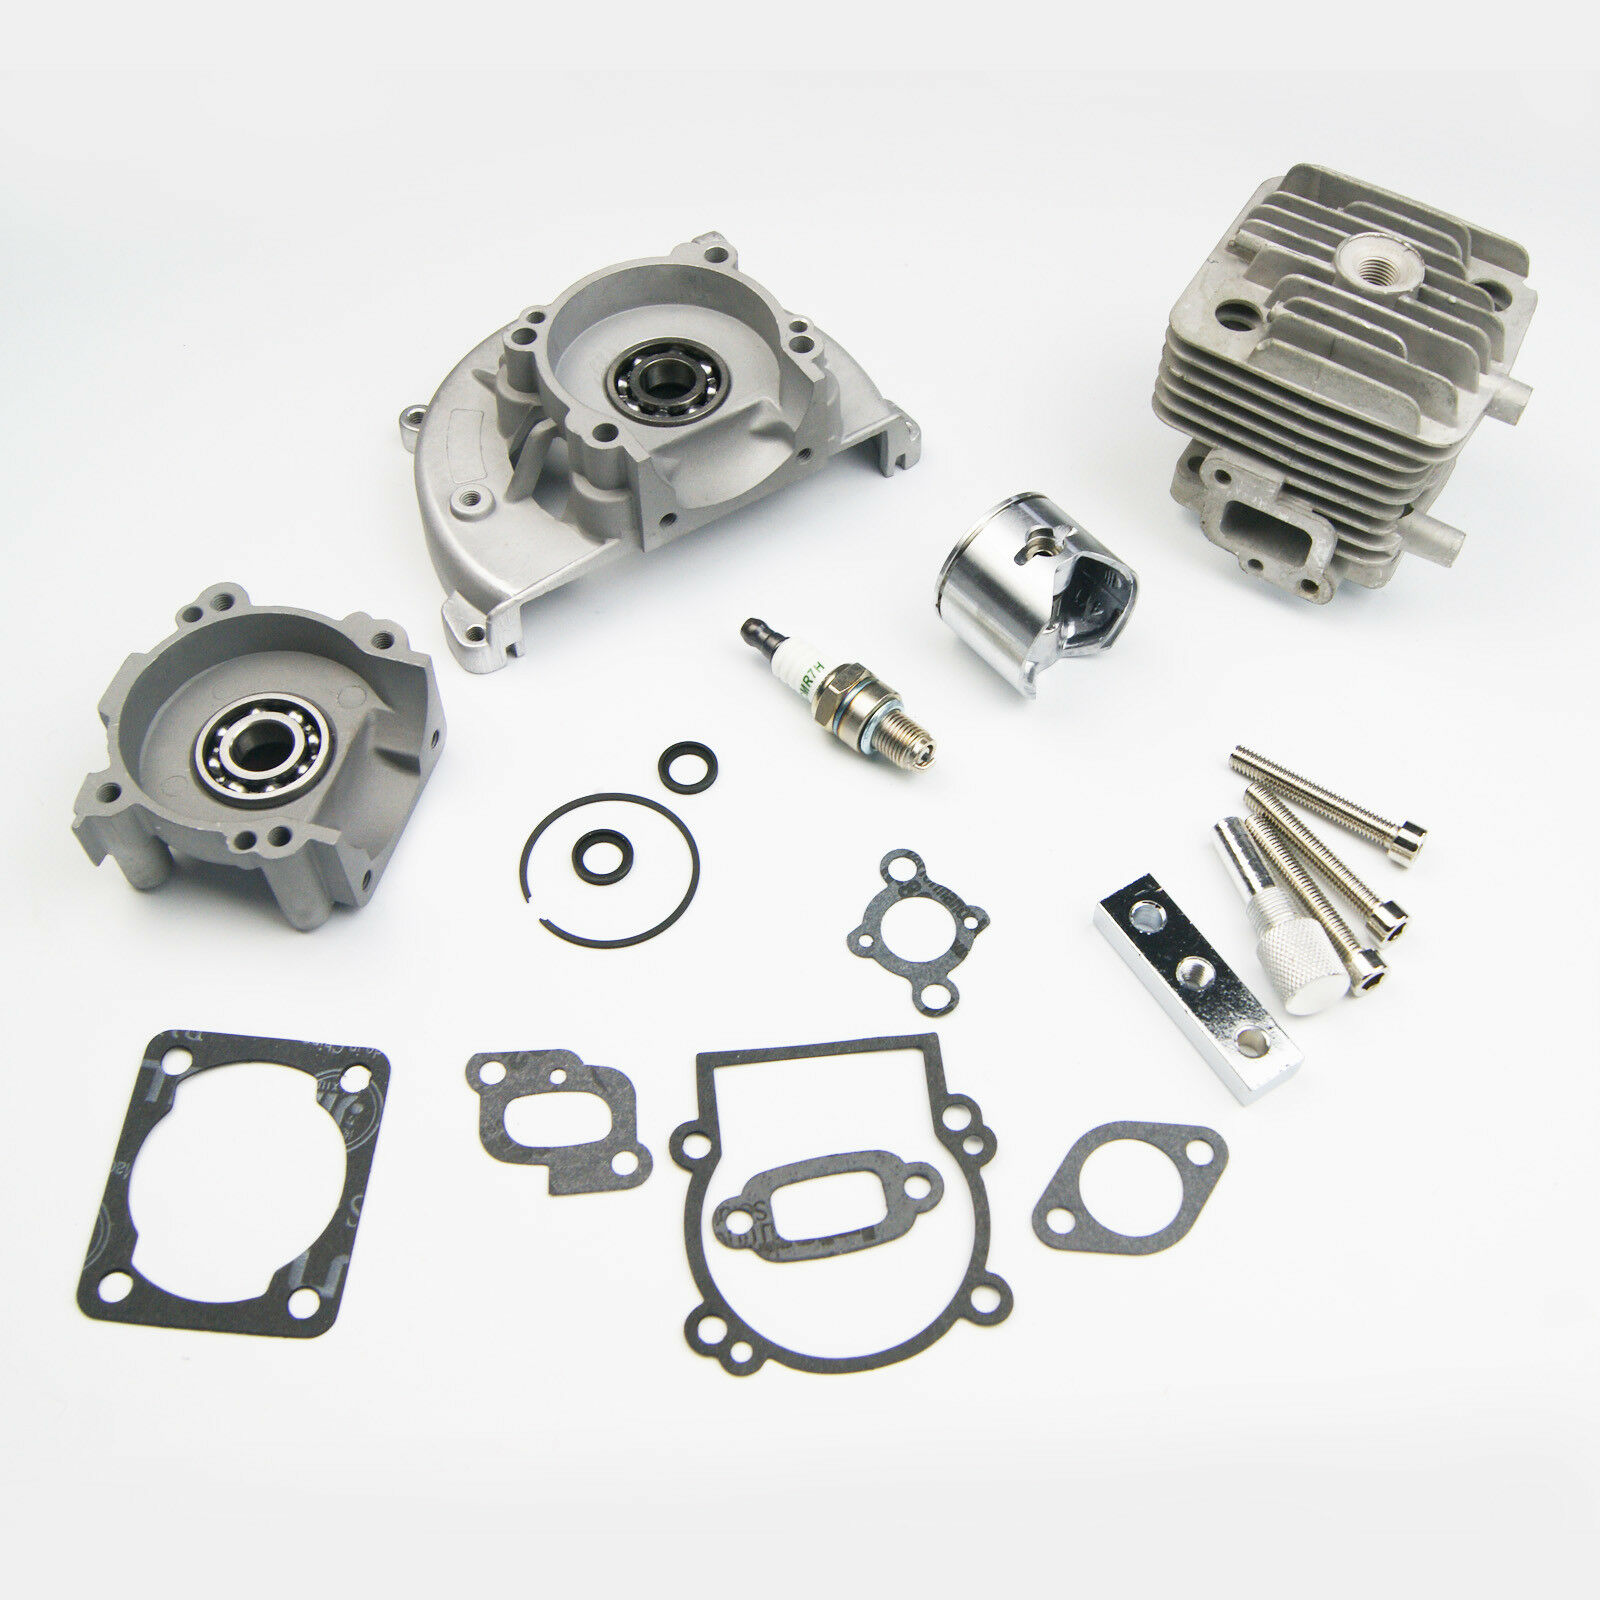 Rovan 4 Bolts 29cc Engine  Kit for piston e cylinder fit ZENOAH for HPI KM GOPE  servizio di prima classe